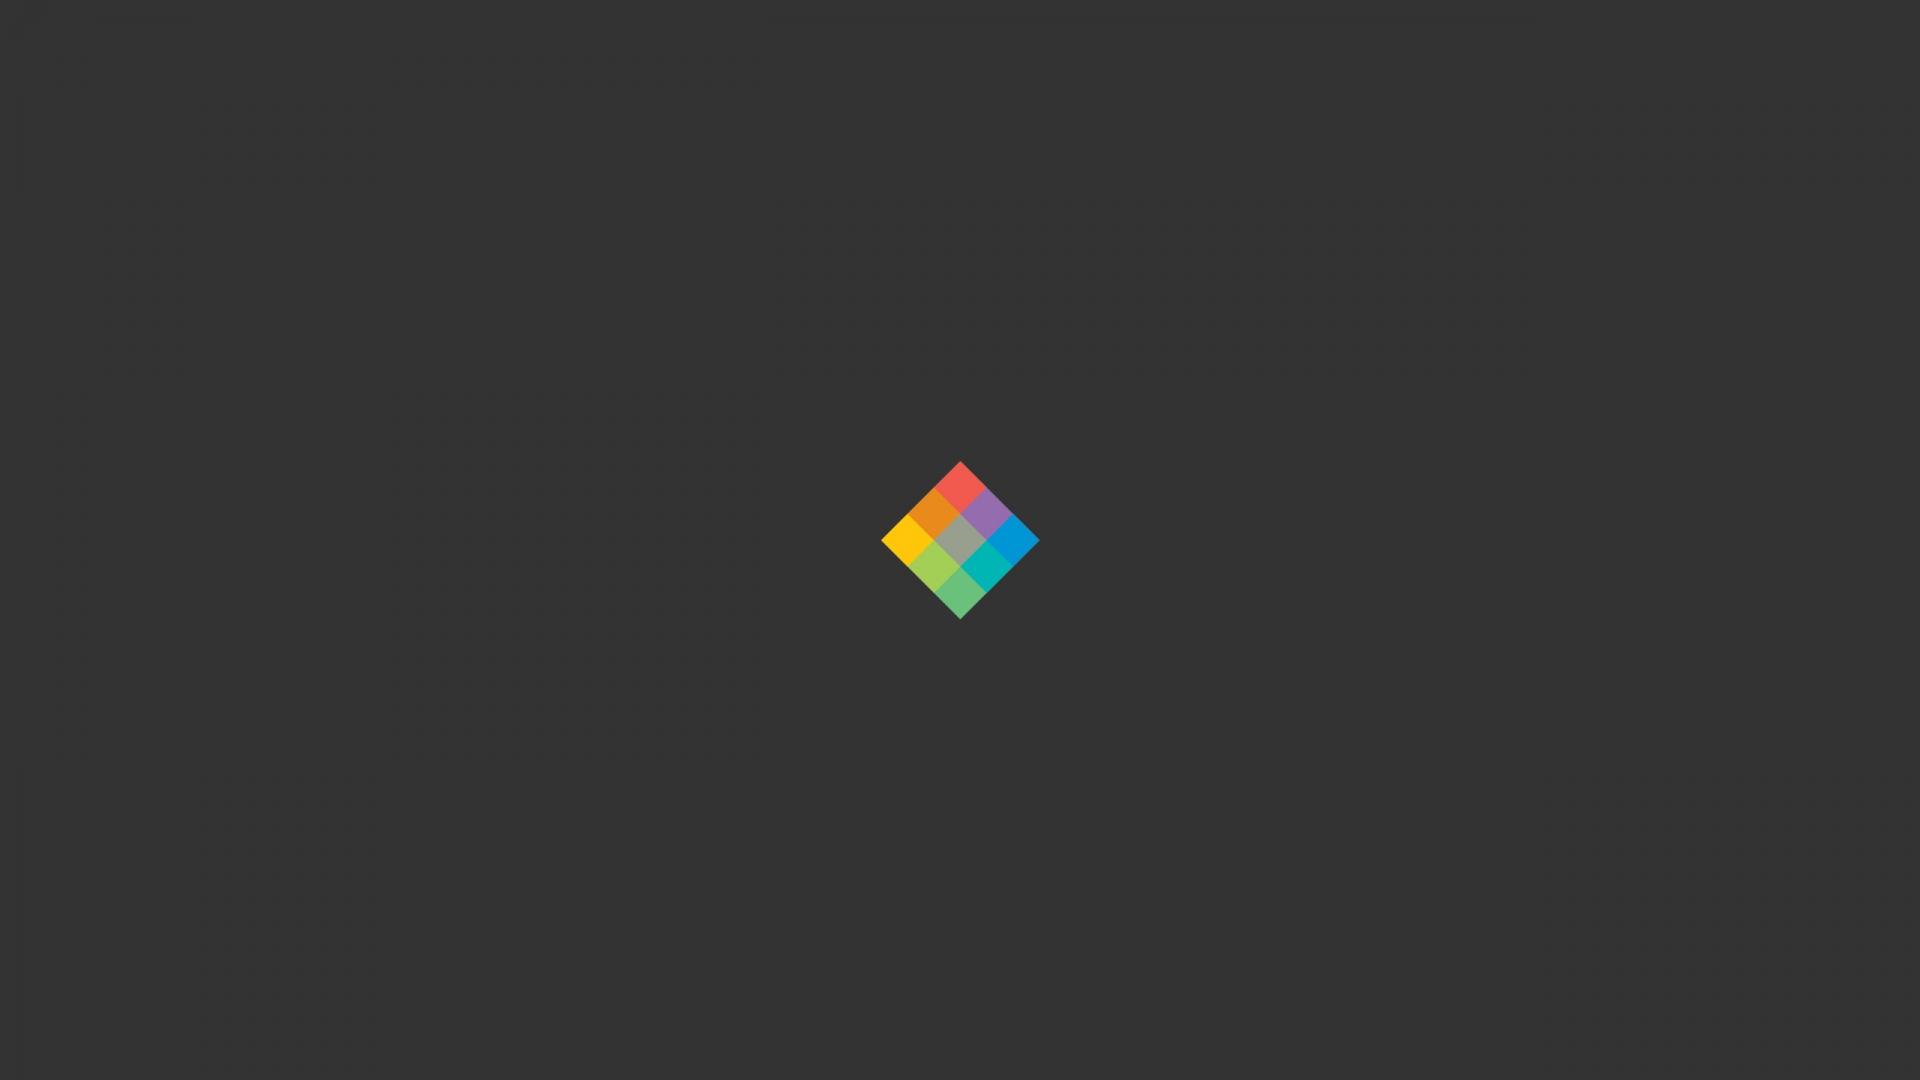 Panda Minimalist Desktop: Minimalist Desktop Wallpaper 1920X1080 ...